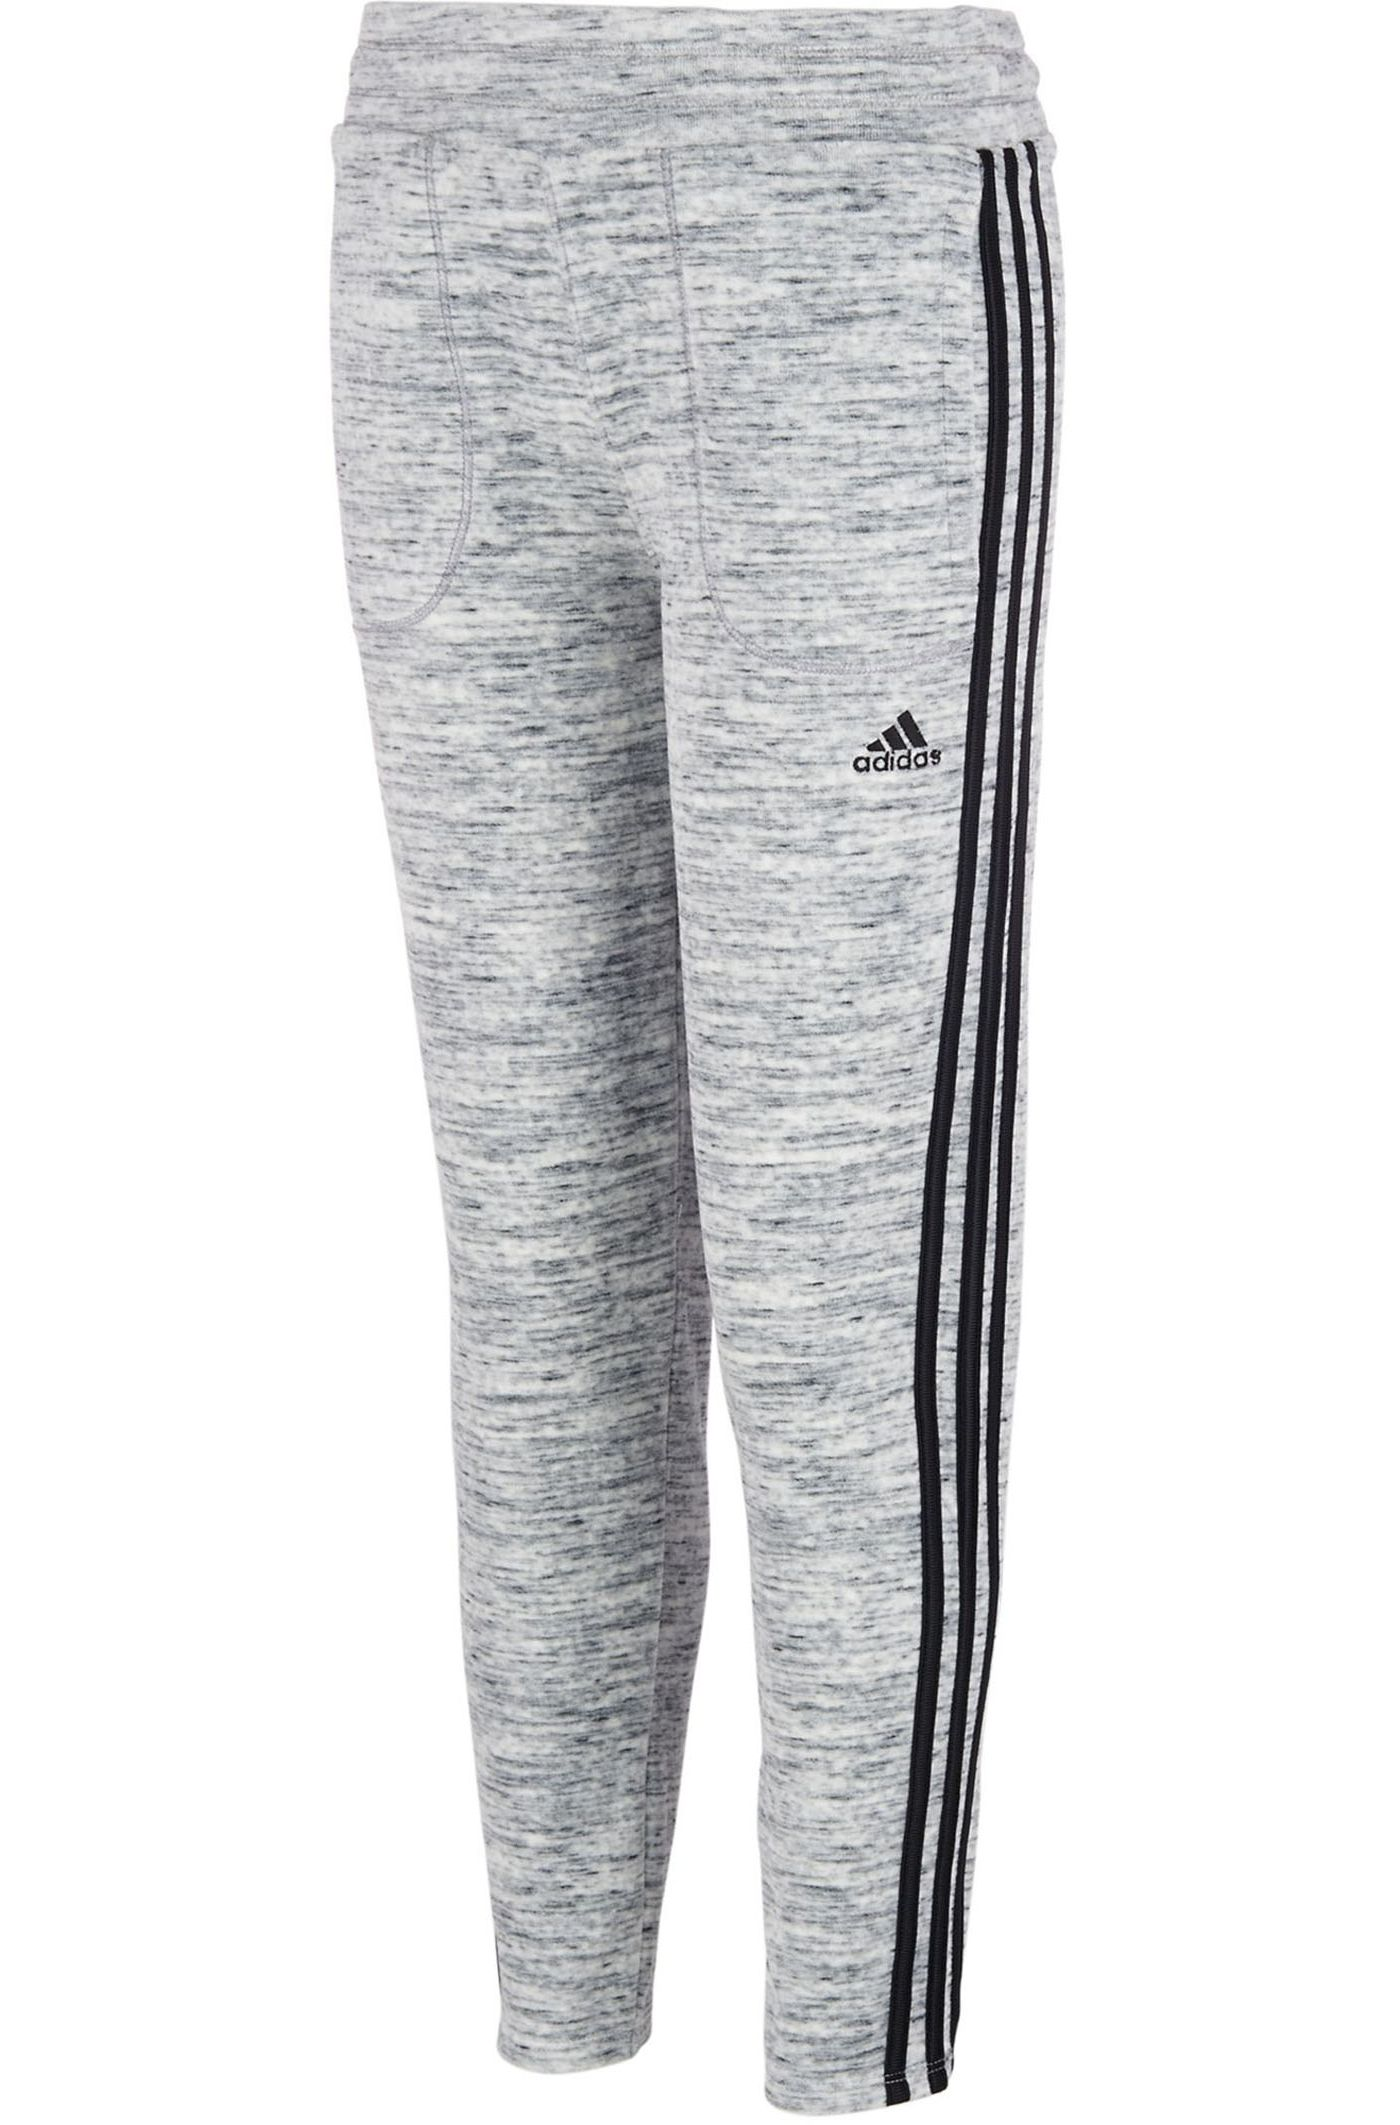 adidas Girls' Velour Heathered Tapered Pants